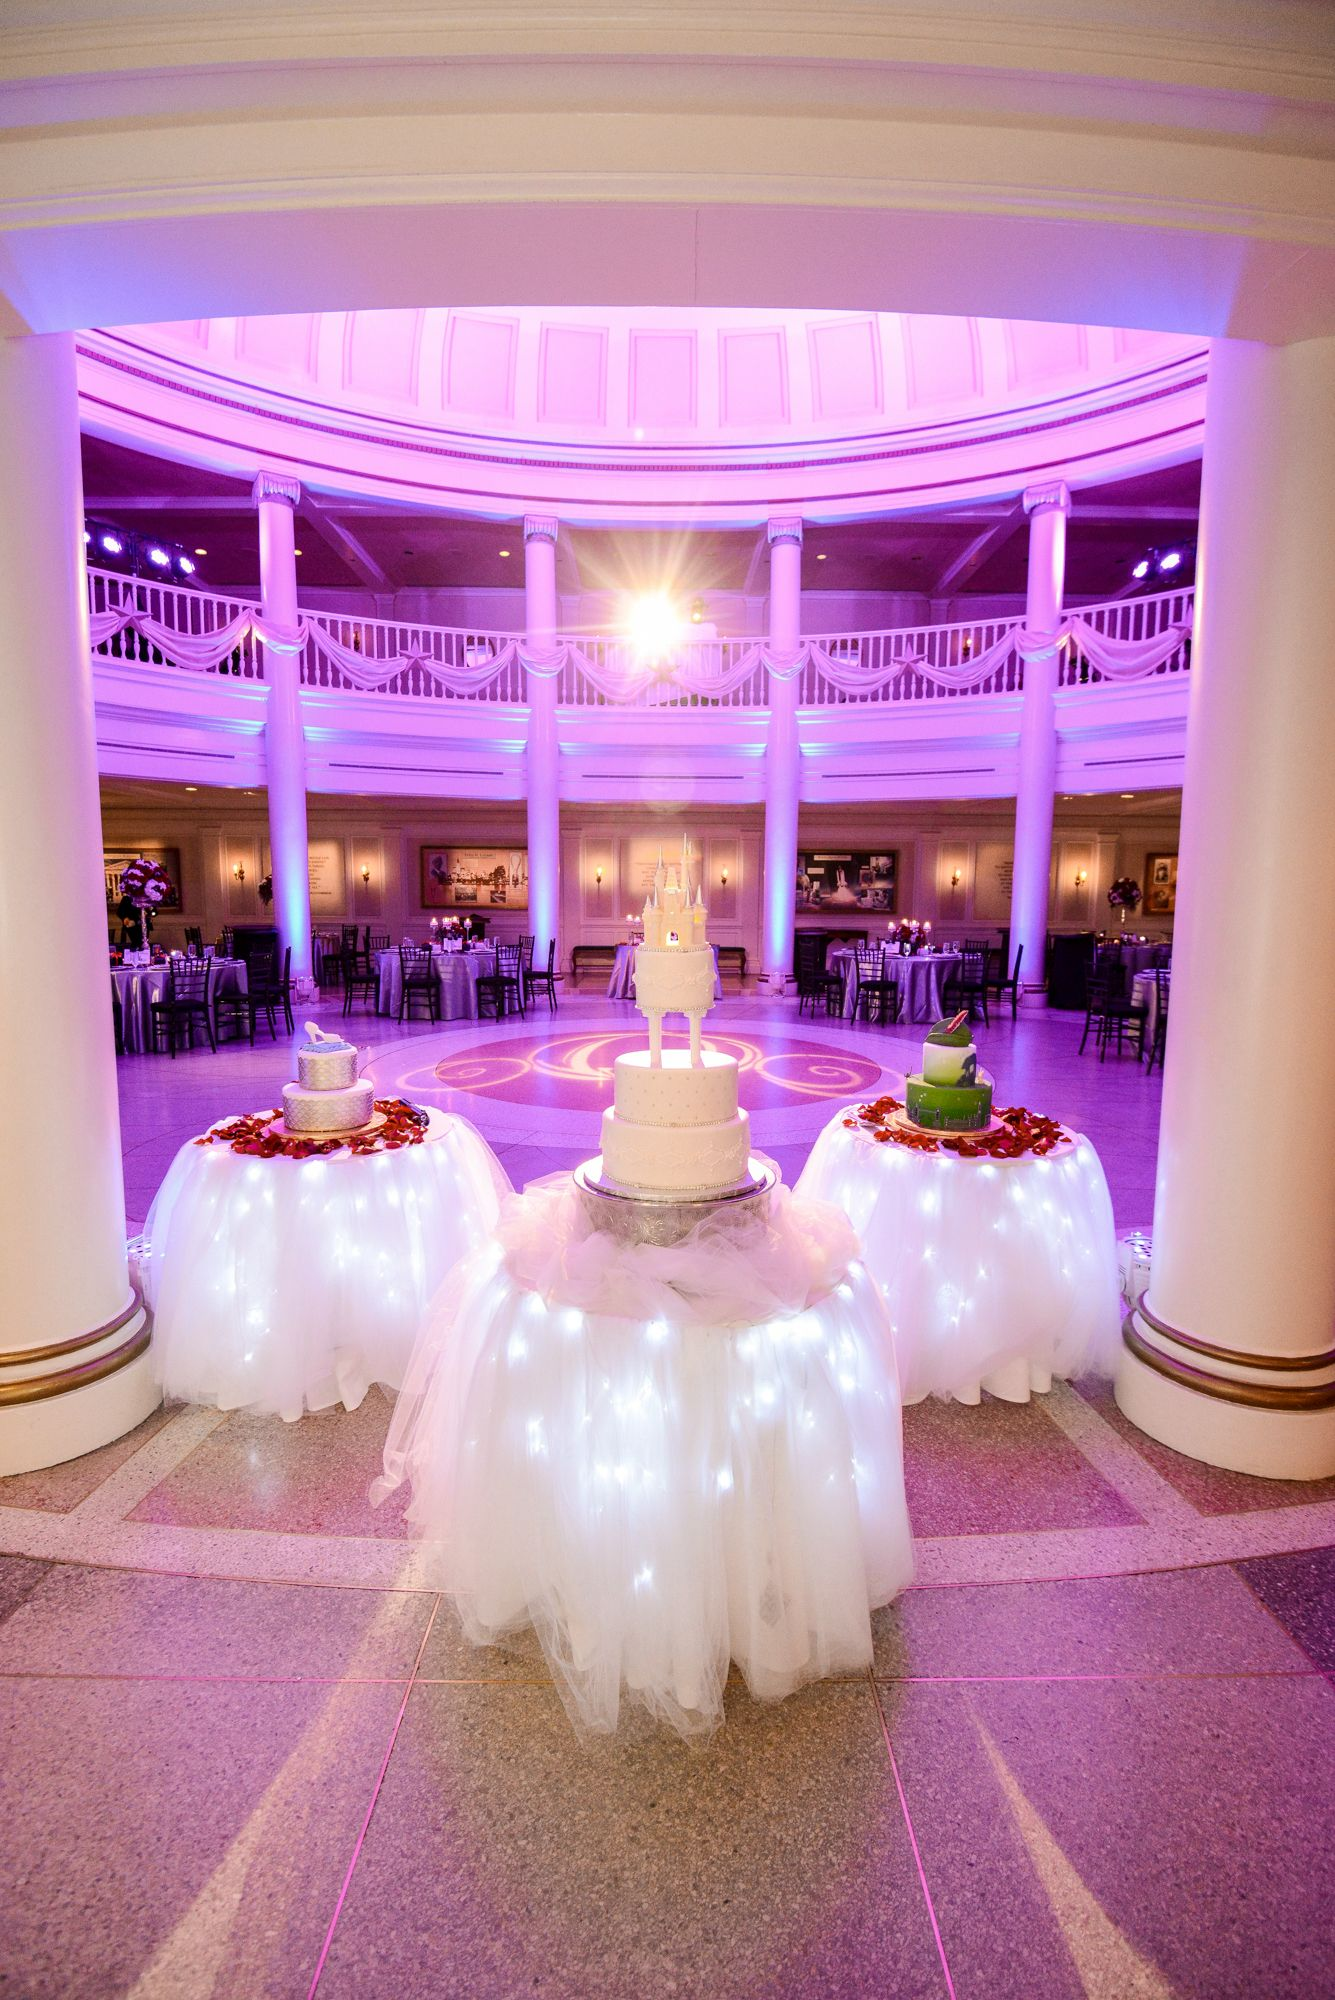 Why Have One Walt Disney World Wedding Cake When You Can Three